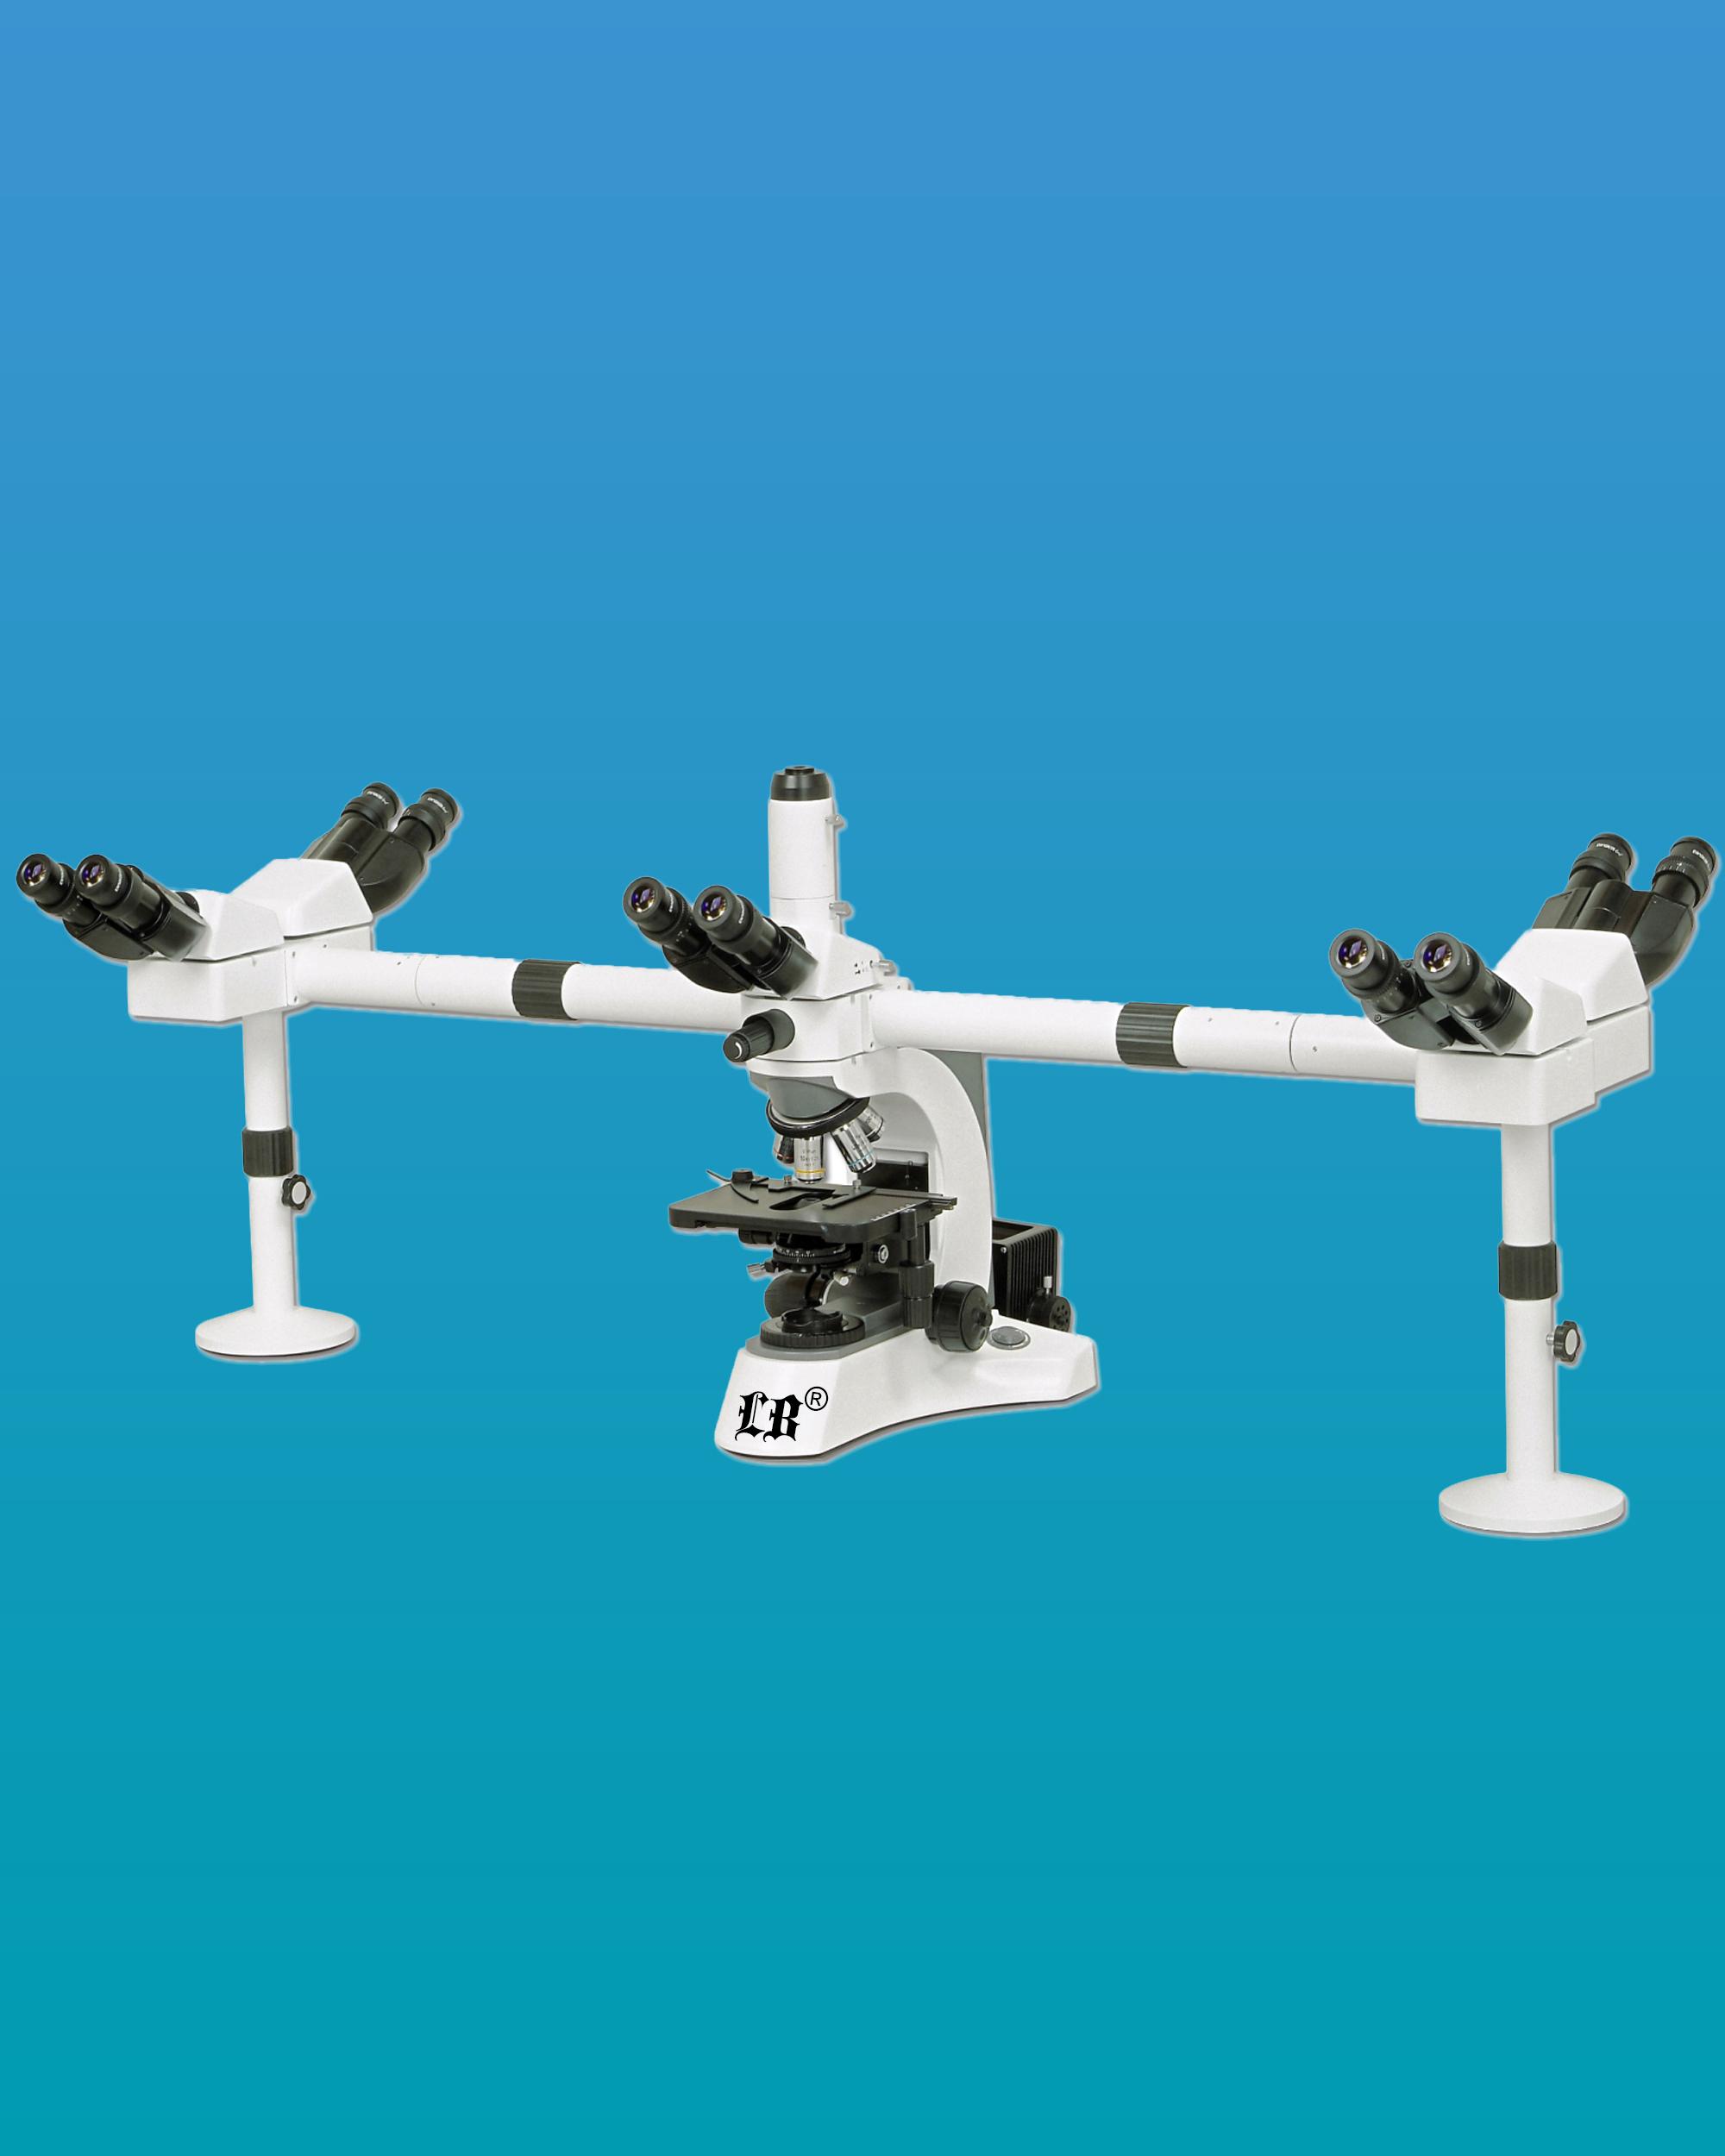 [LB-984] Multi-Head Microscope for 6 Simultaneous Users, 5 Users w/ a Binocular Head & Trinocular Head